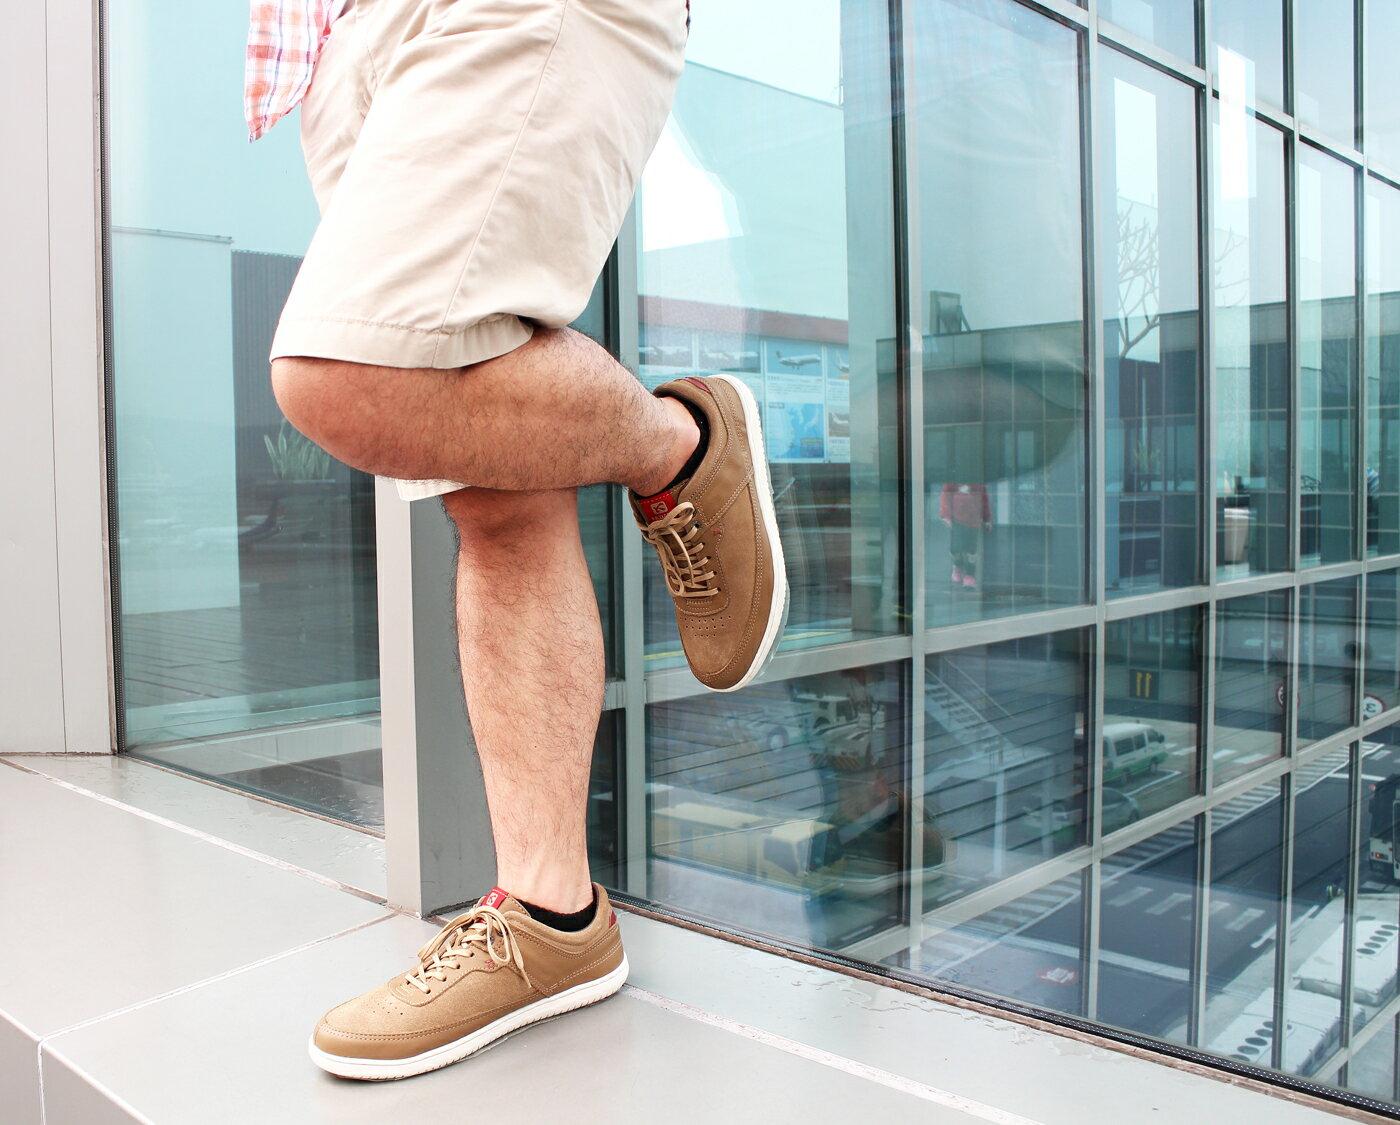 【KILDARE 85折】KILDARE 綁帶休閒鞋 淺咖啡 男 慢跑休閒 4